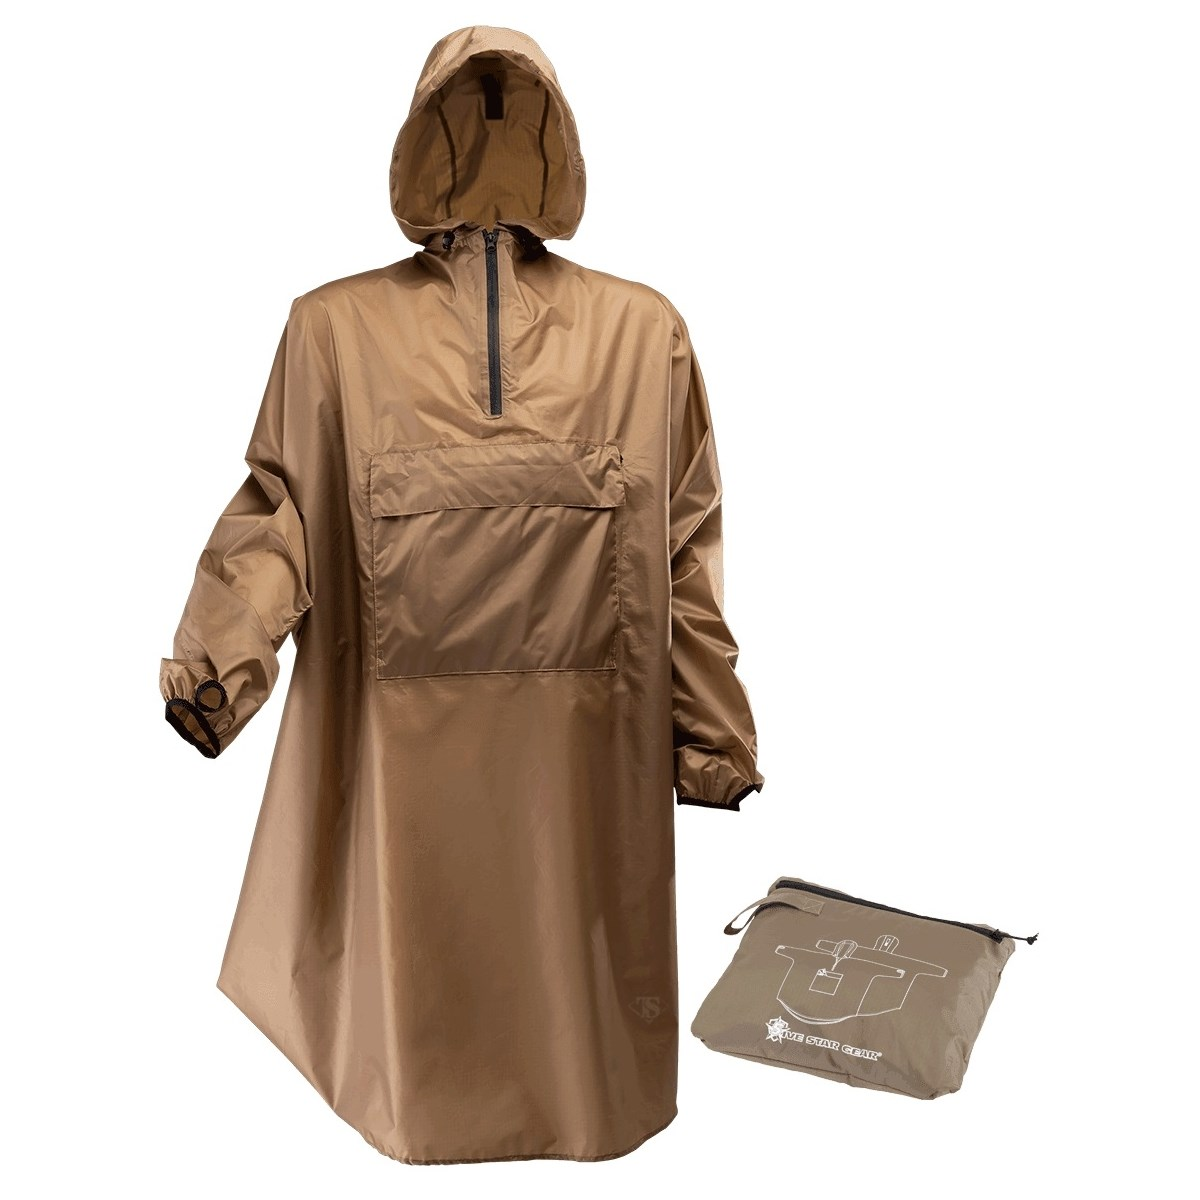 Pláštìnka SENTINEL s kapsou TAN499 - zvìtšit obrázek